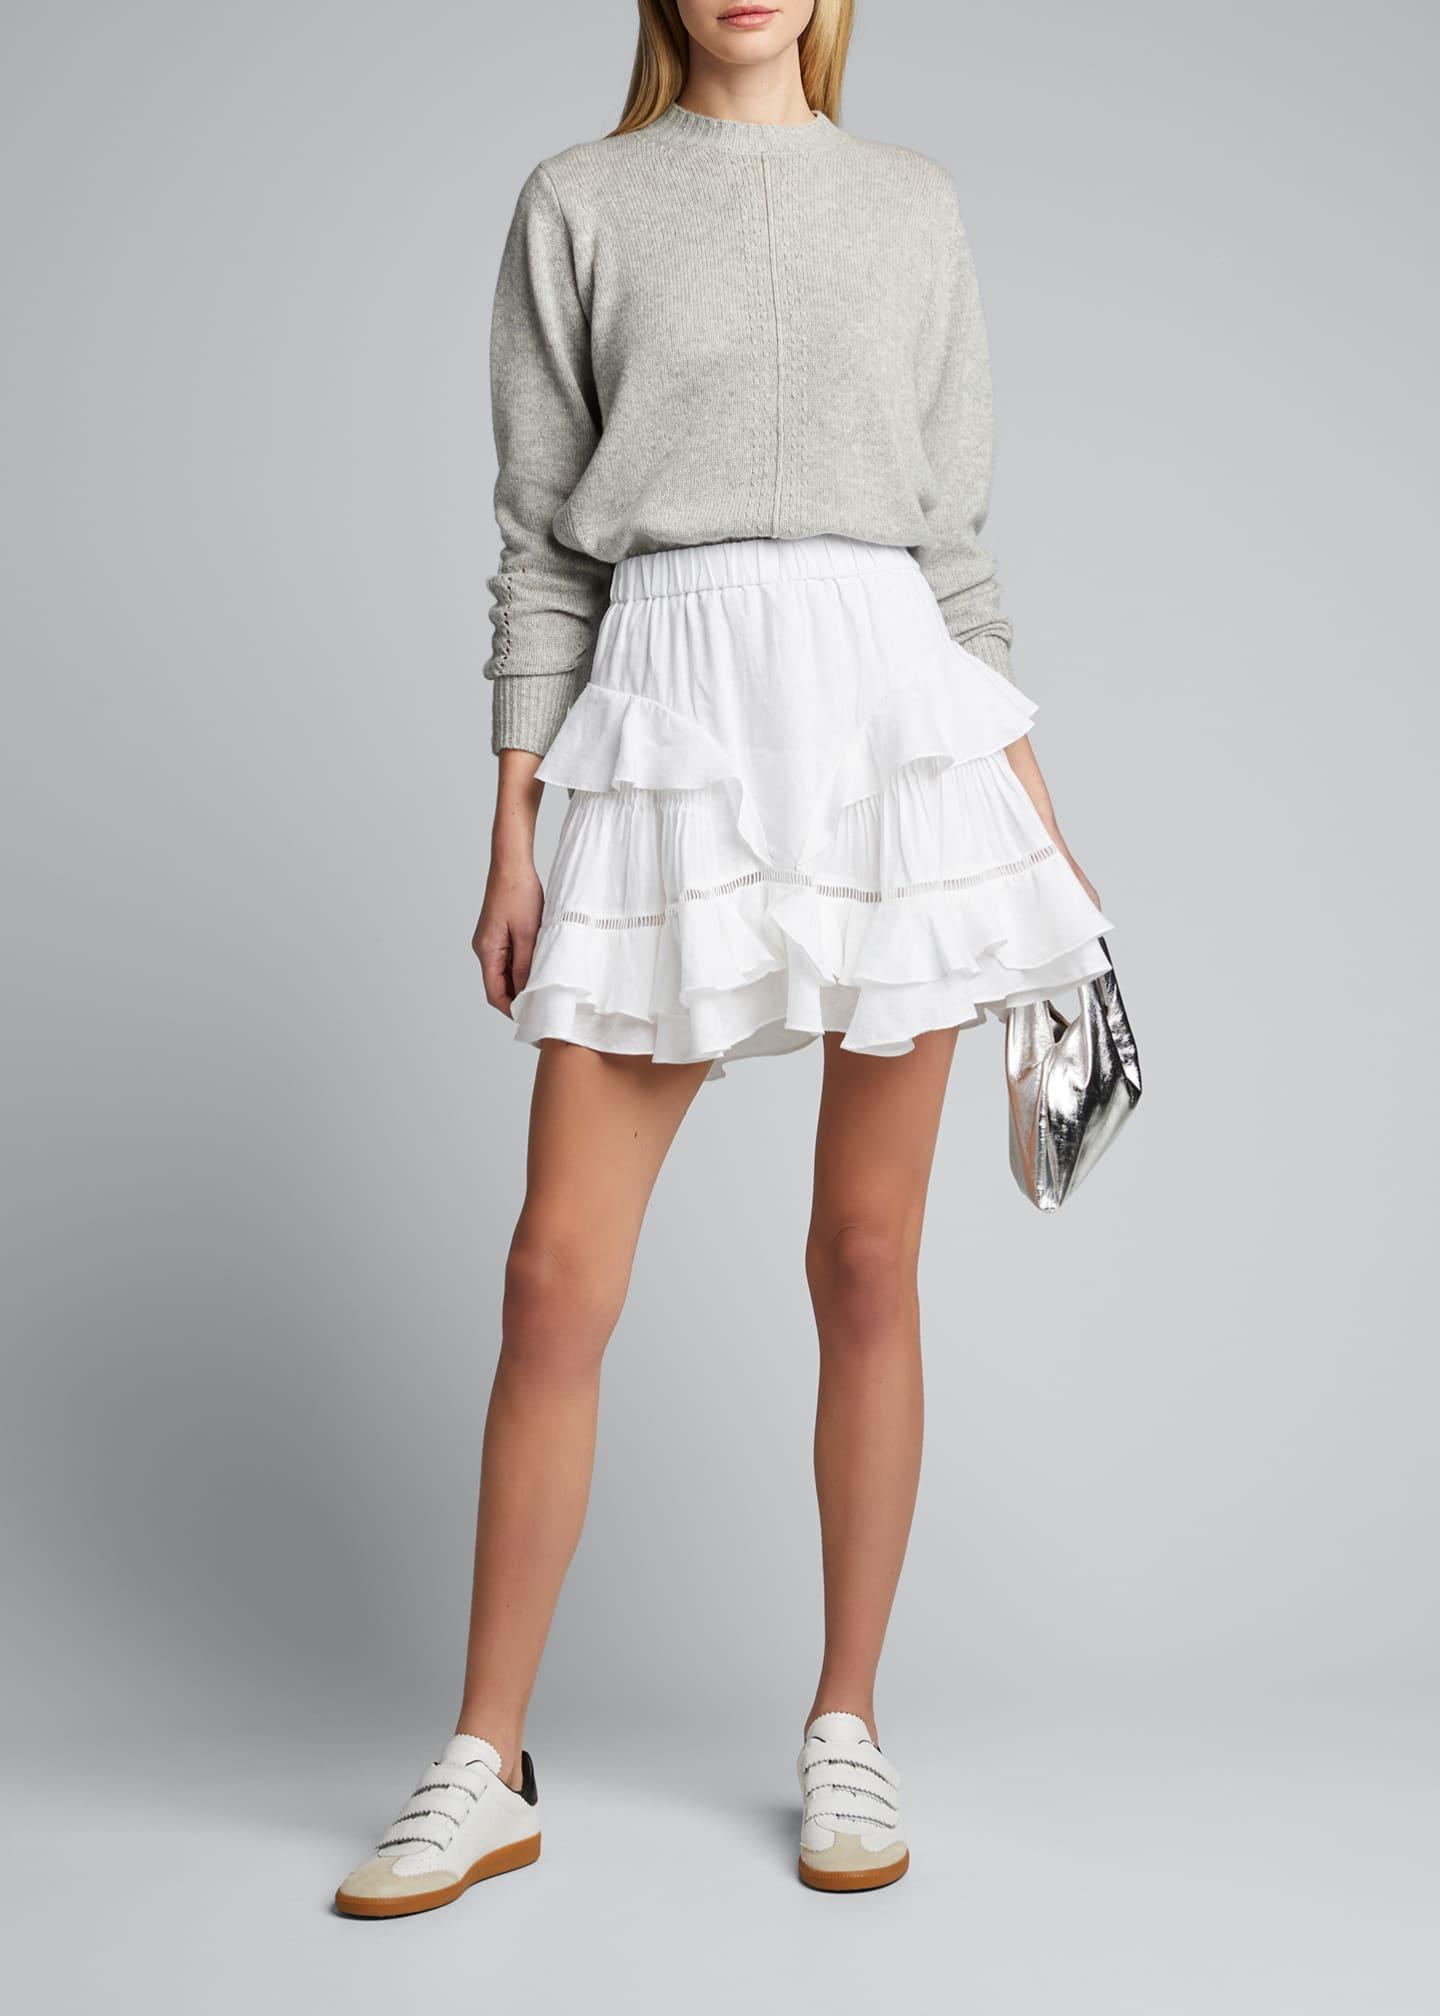 Etoile Isabel Marant Alikaya Linen Flounce Skirt